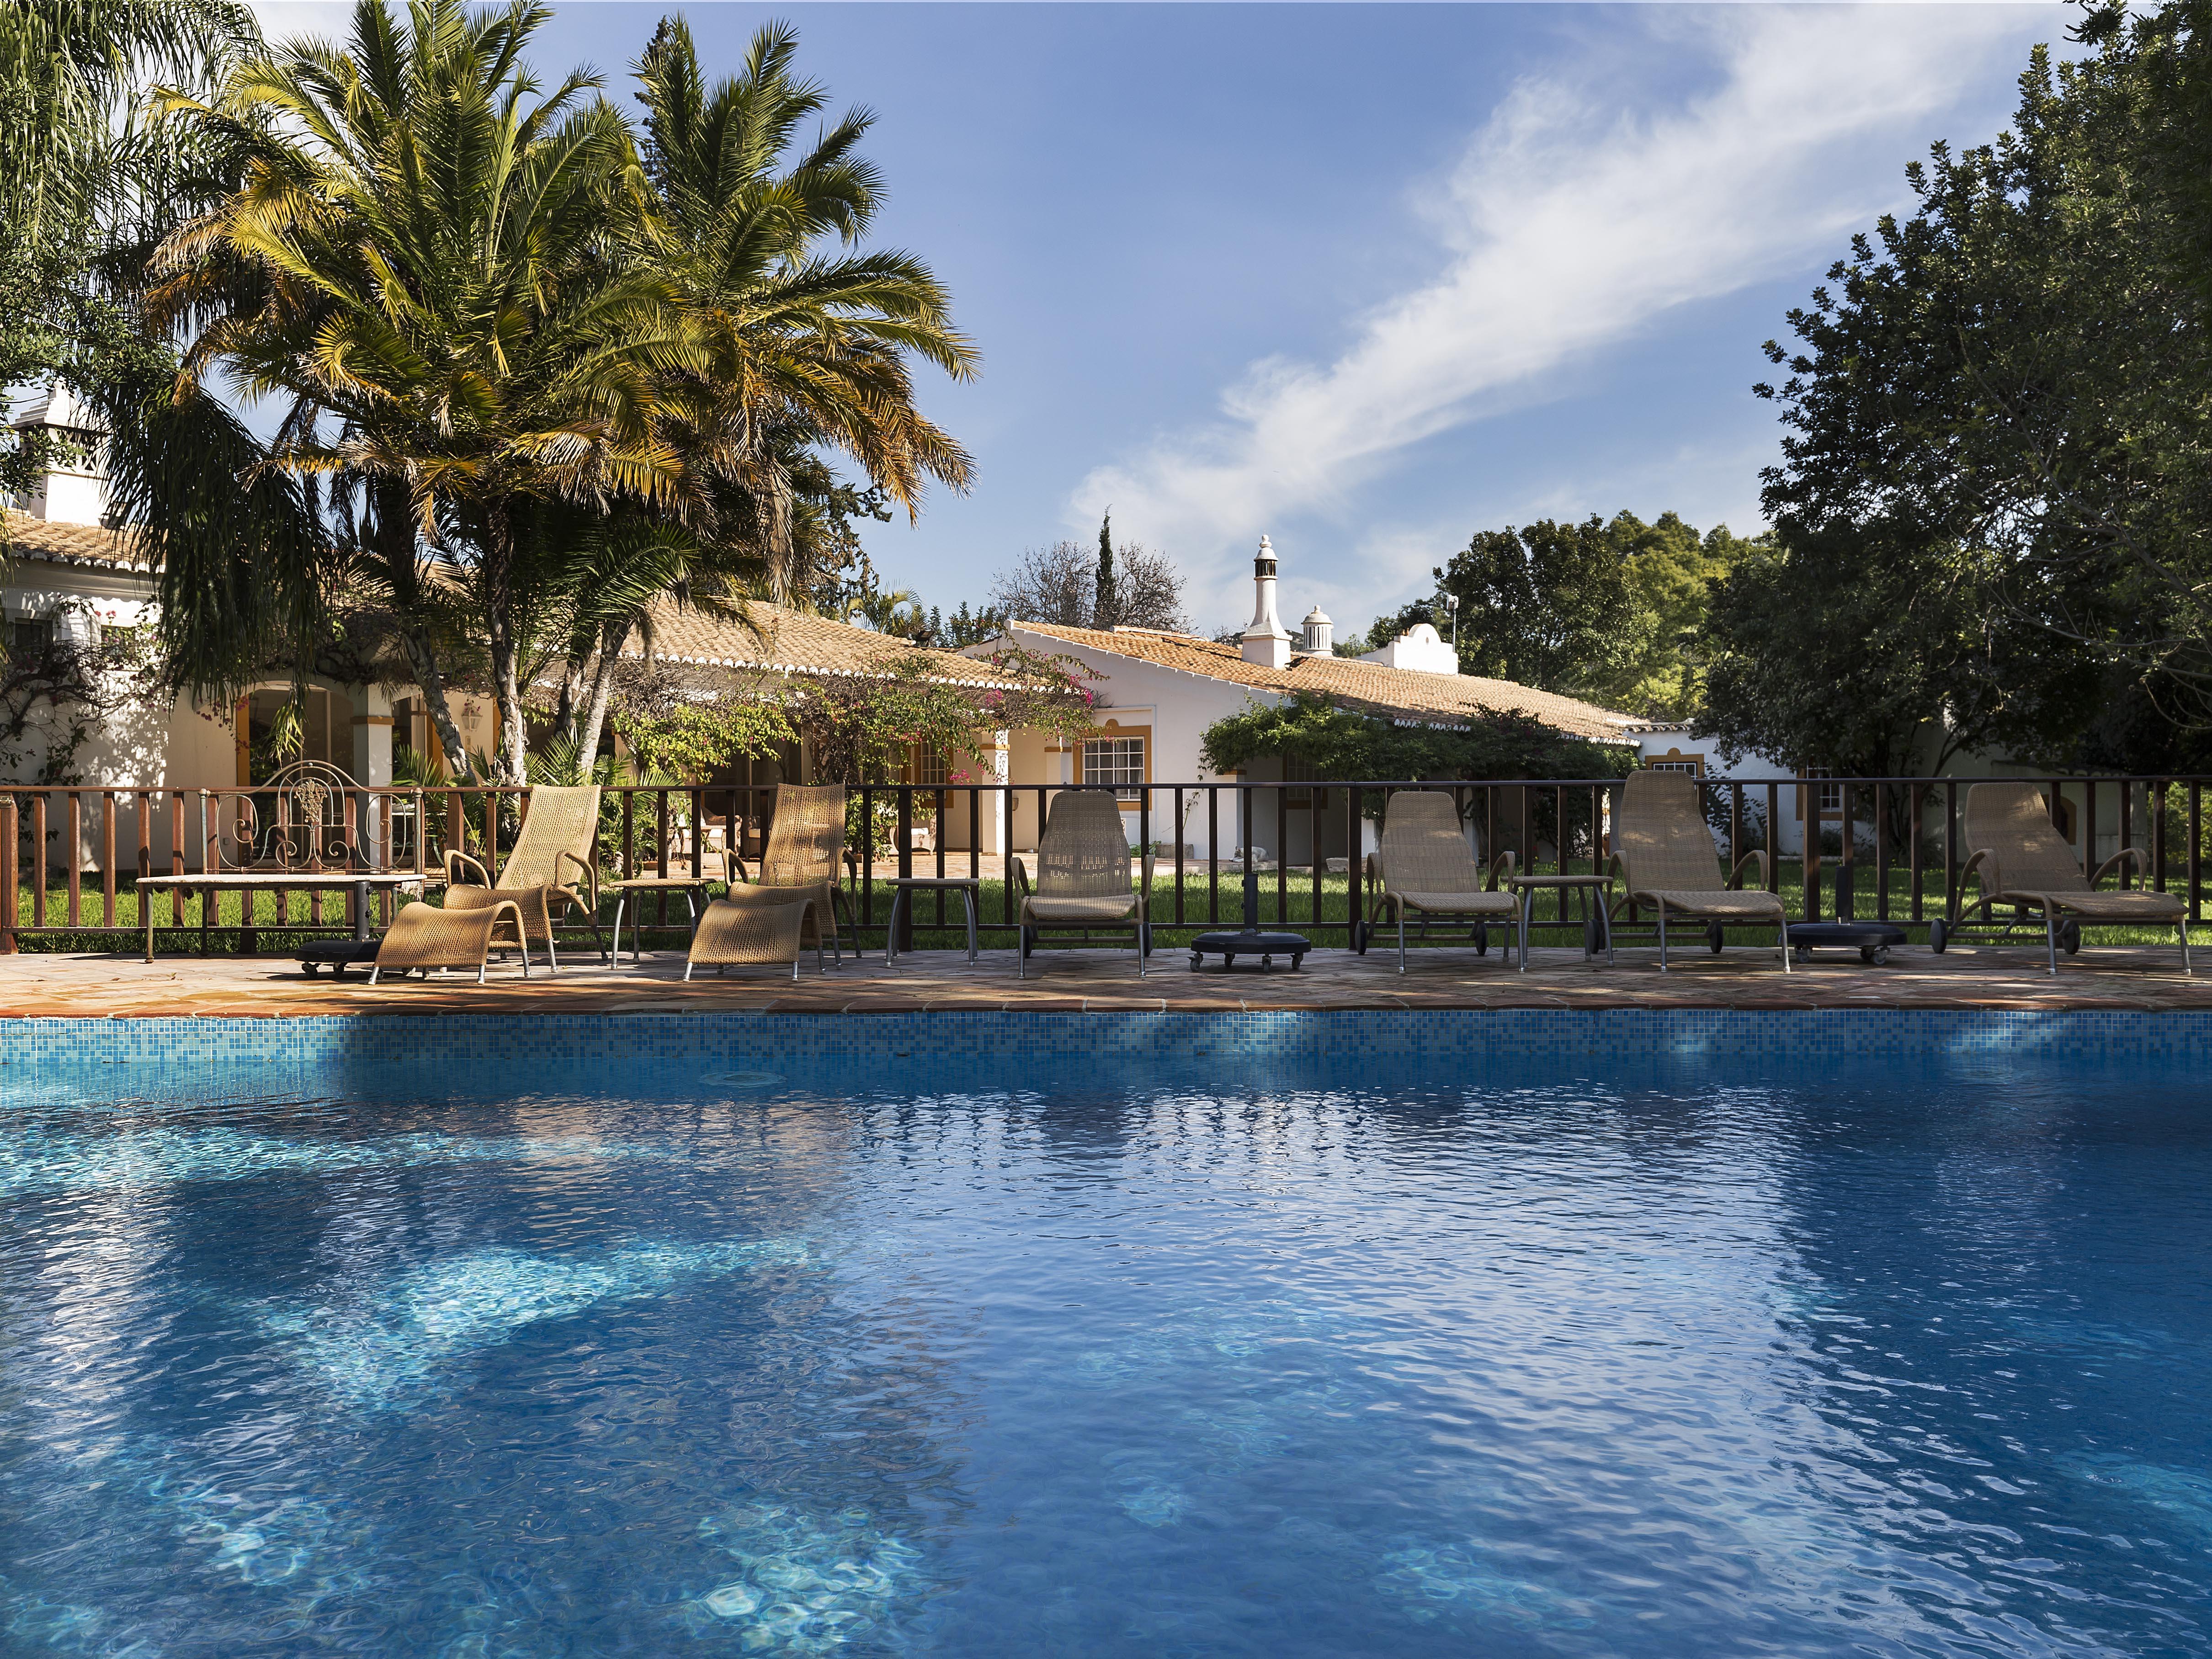 Farm / Ranch / Plantation for Sale at Country Estate, 10 bedrooms, for Sale Faro, Algarve, 8005-483 Portugal